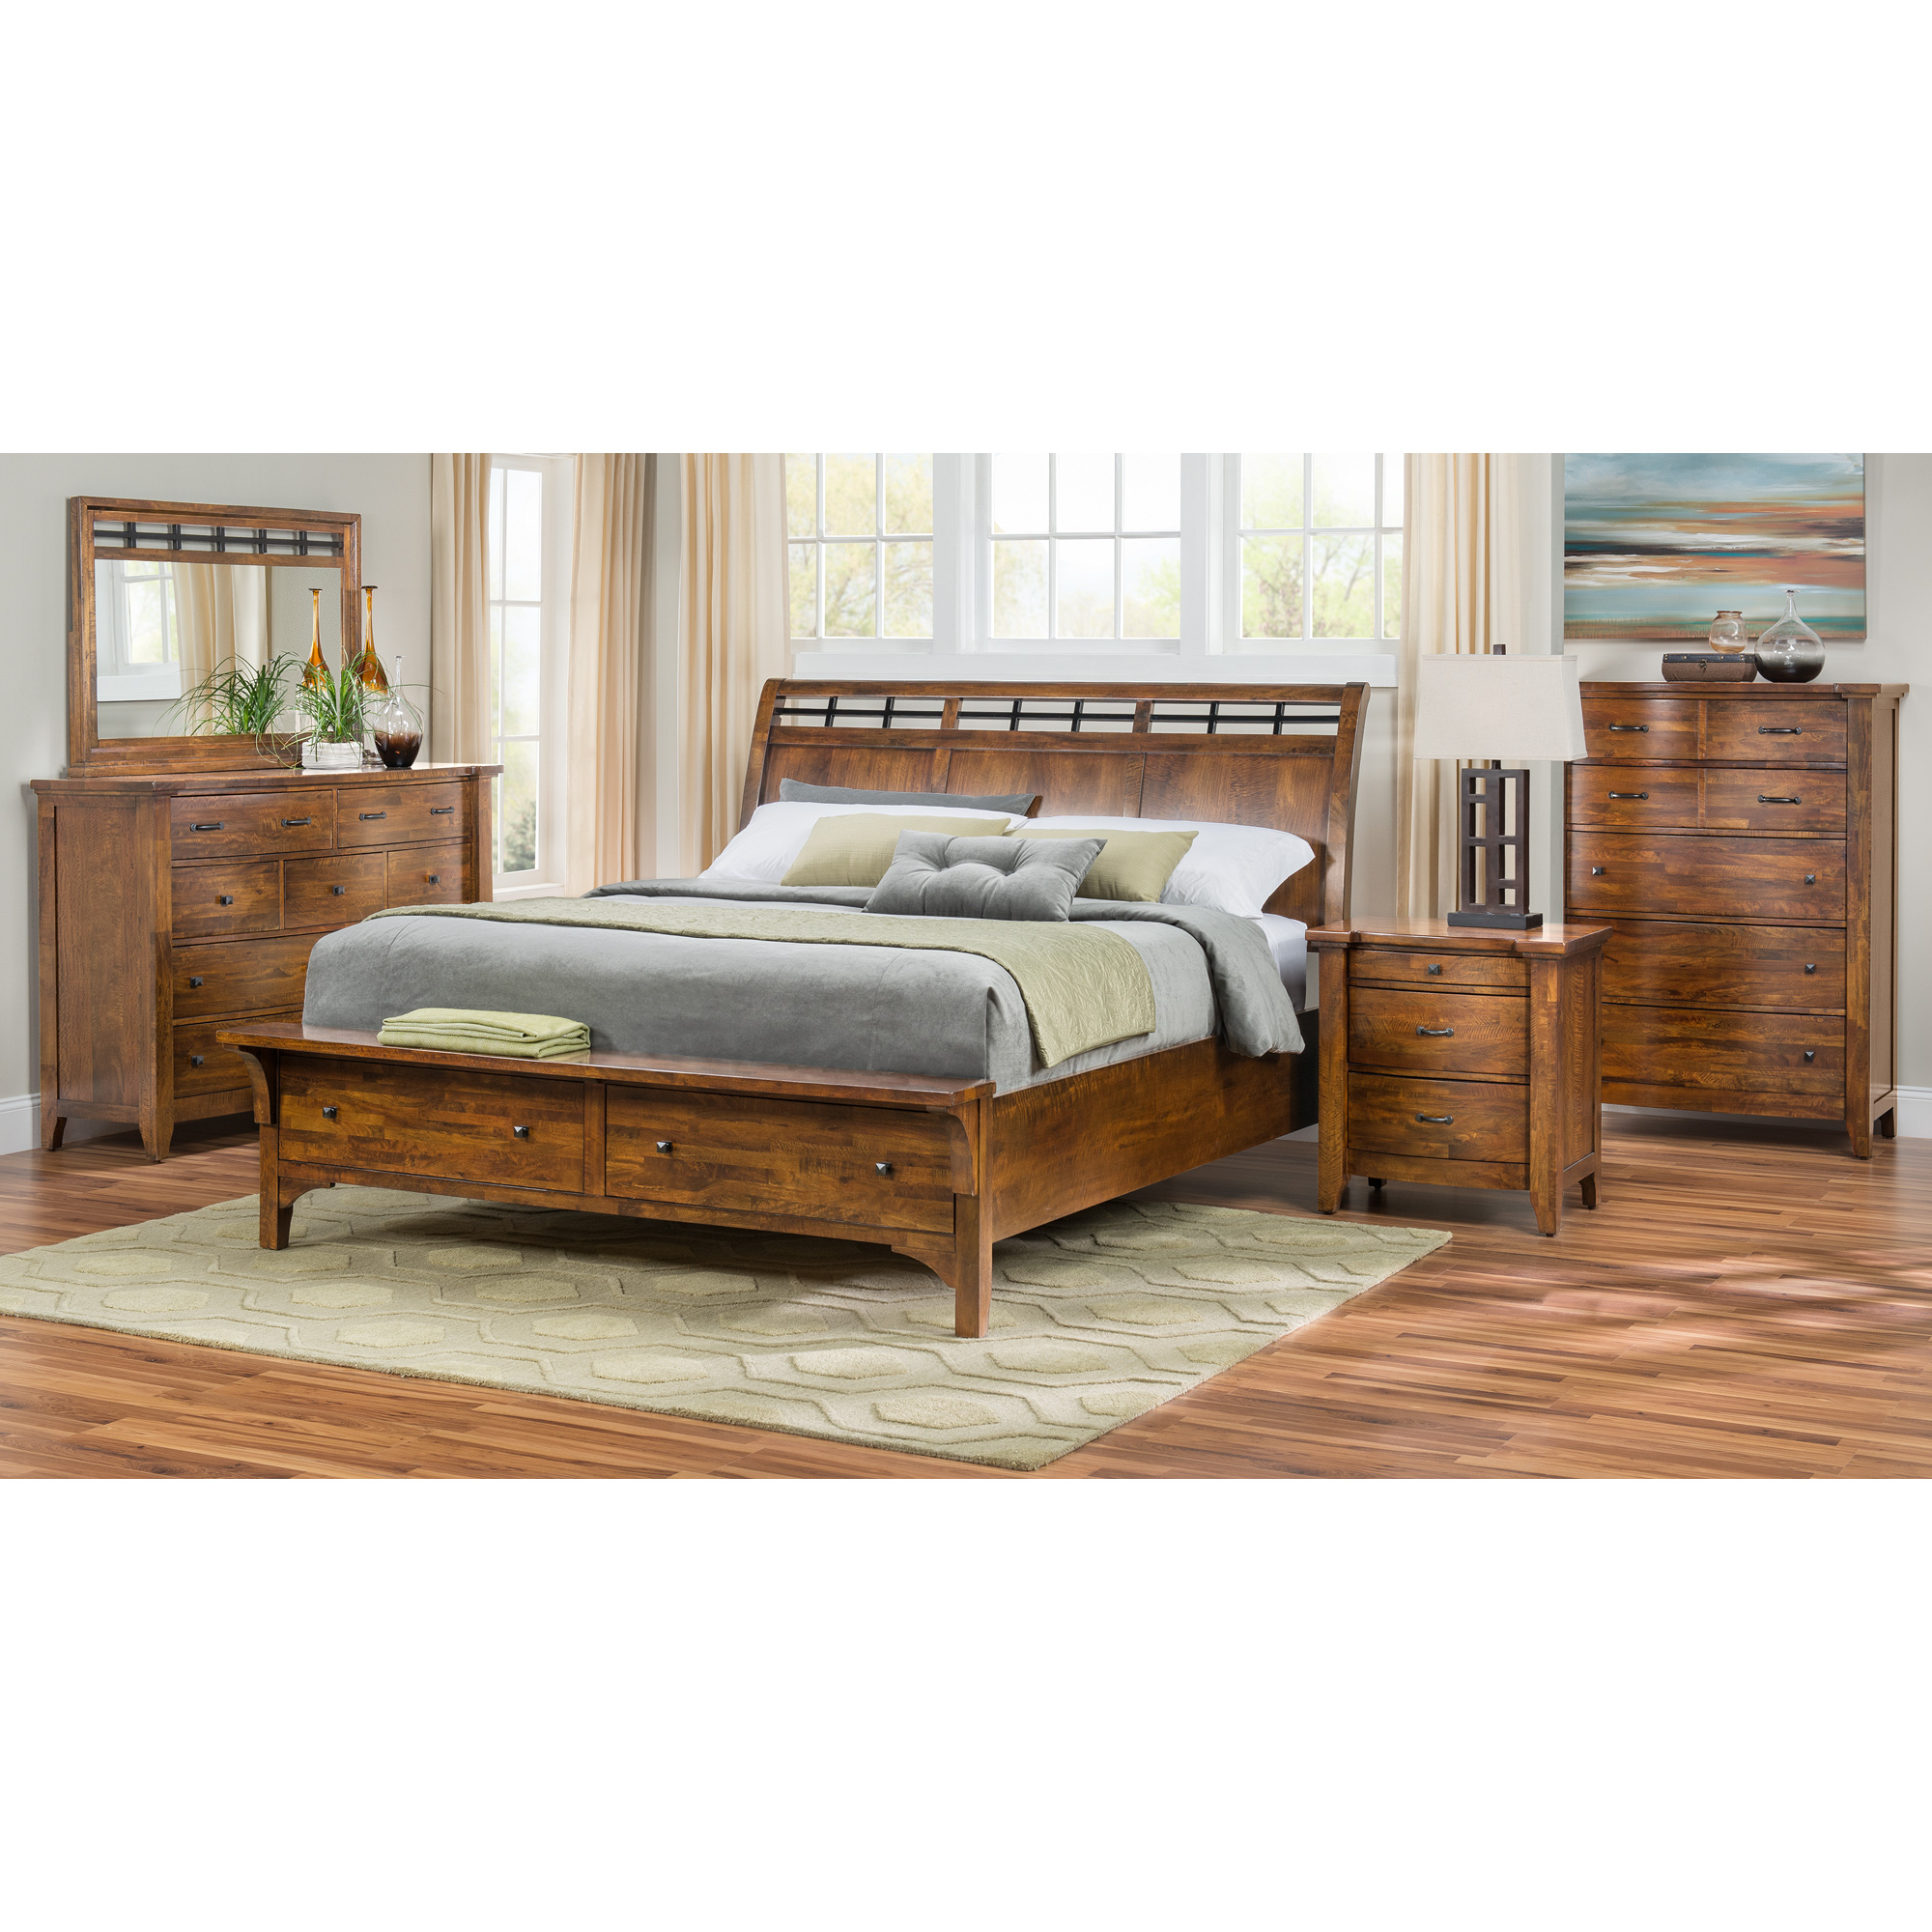 Napa Furniture | Whistler Retreat Dark Walnut California King Storage 4 Piece Room Group Bedroom Set